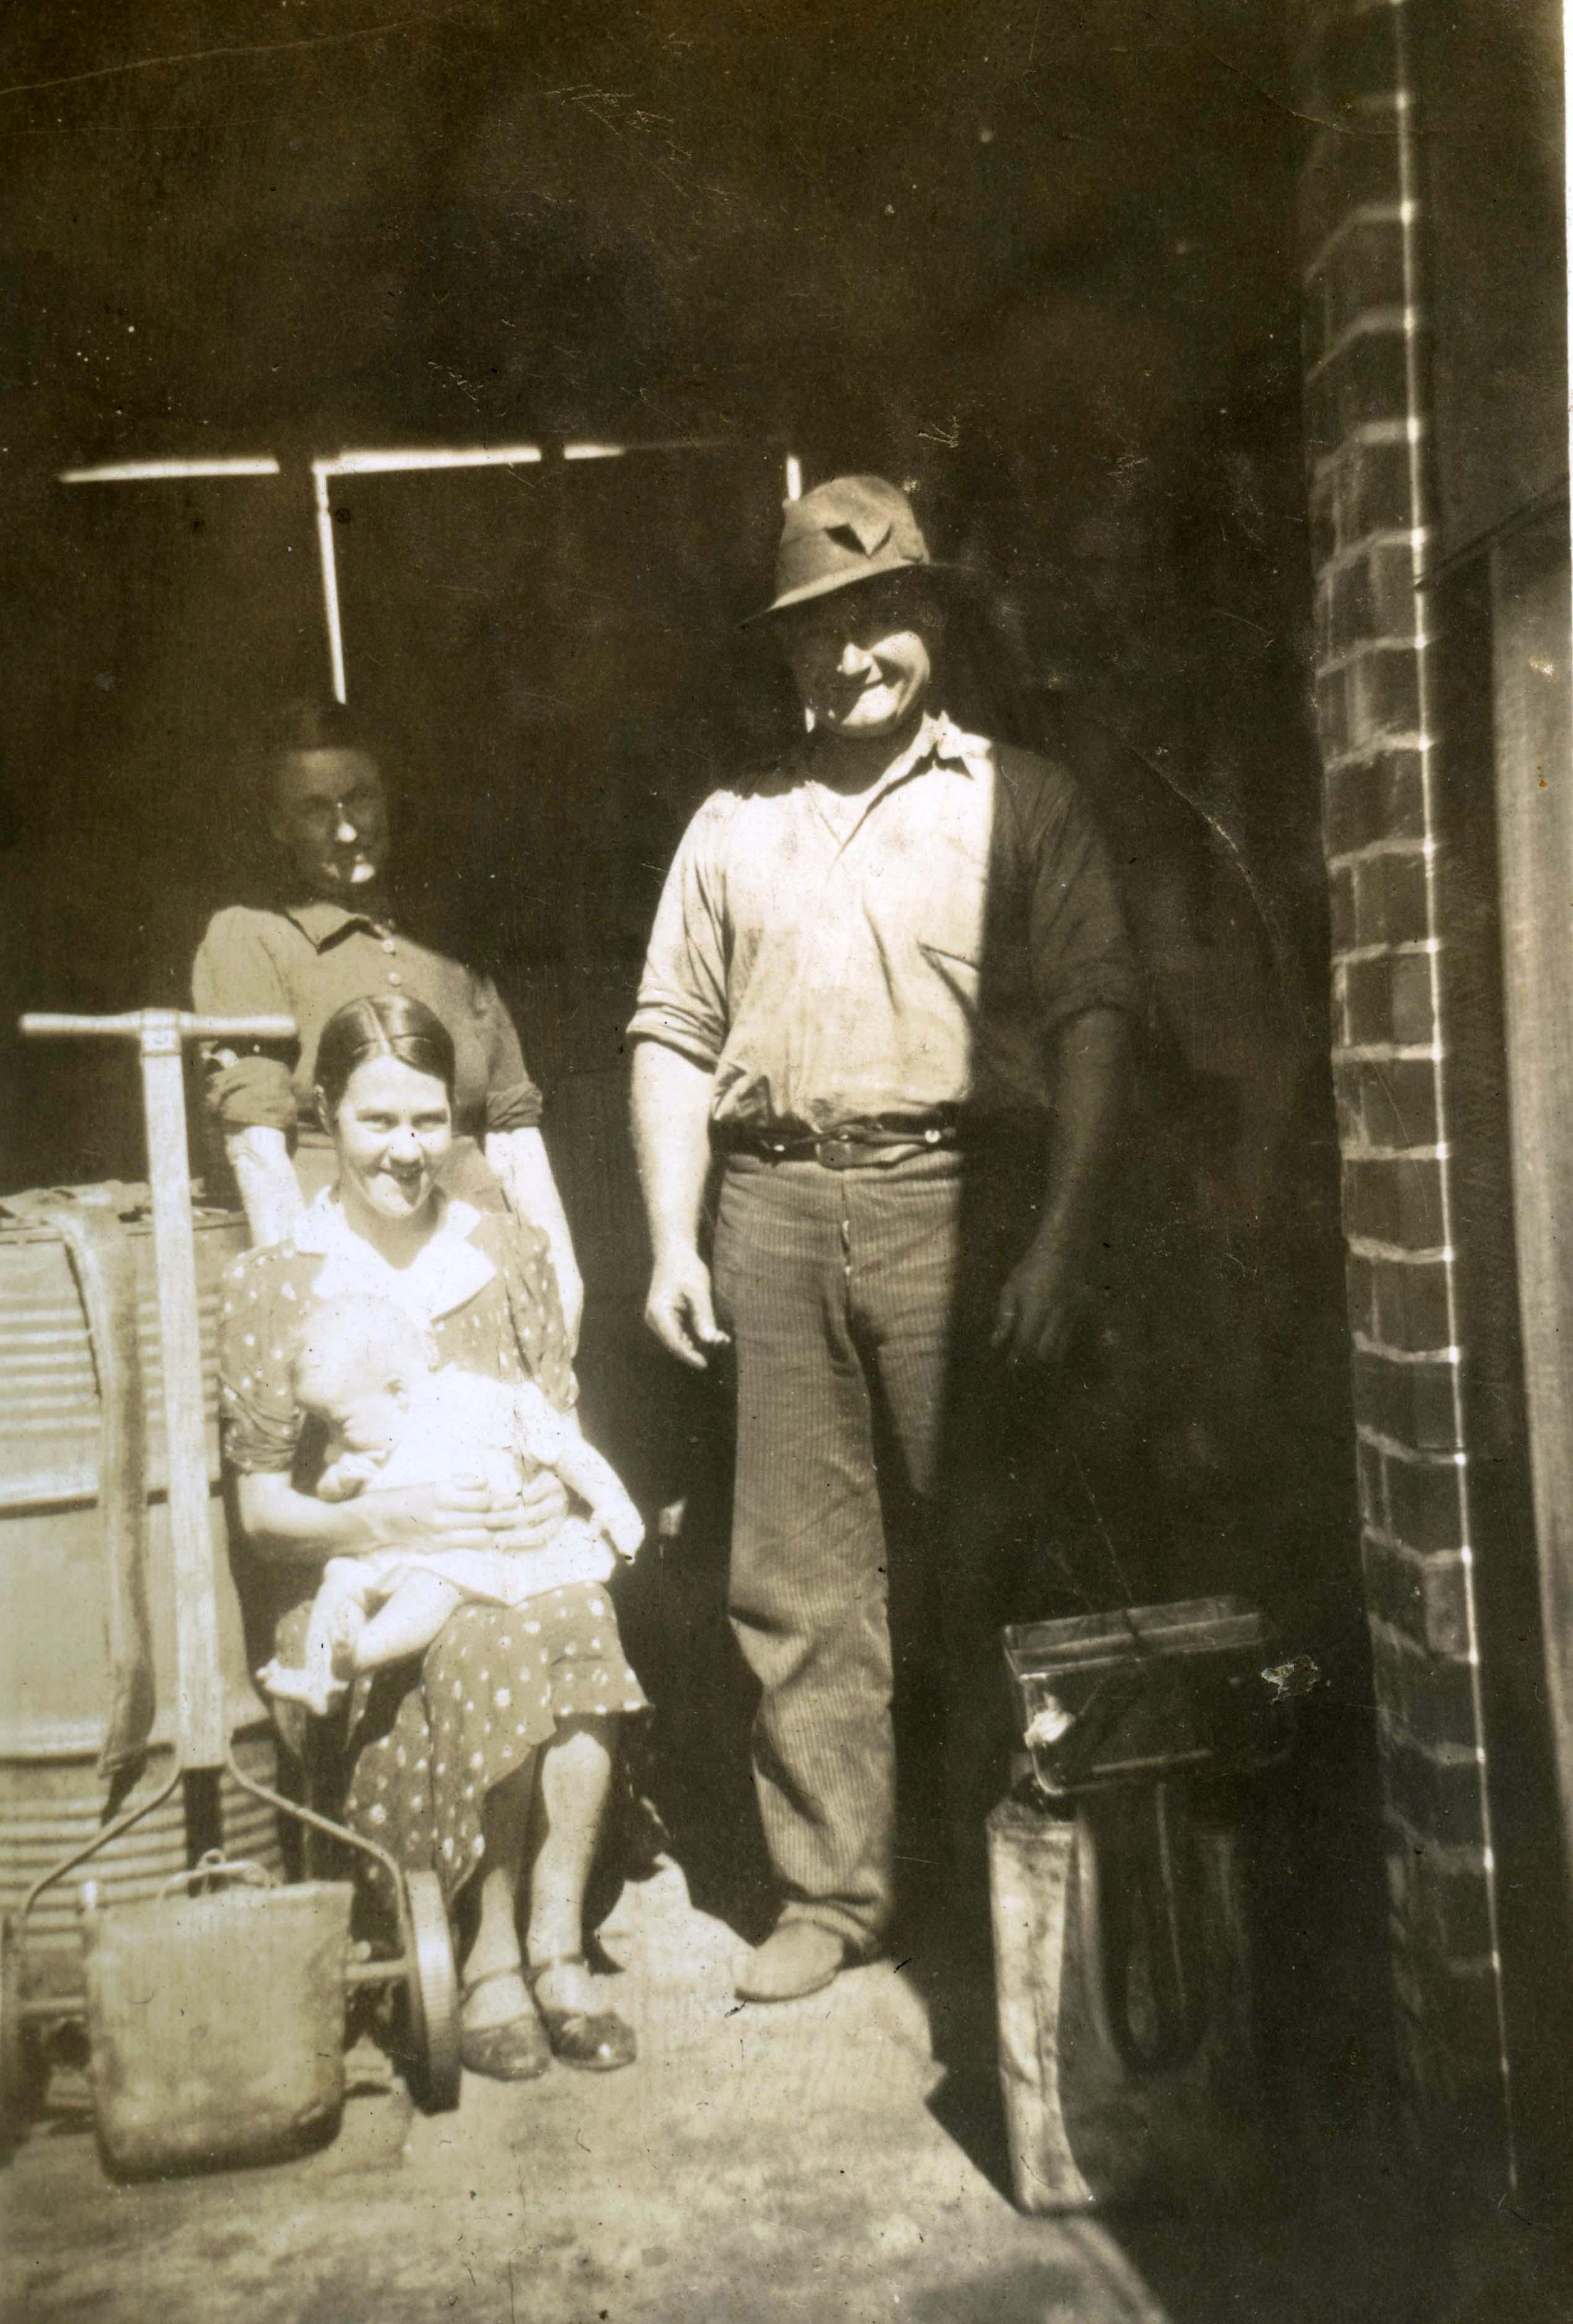 166. Backyard in Doris Street, 1930